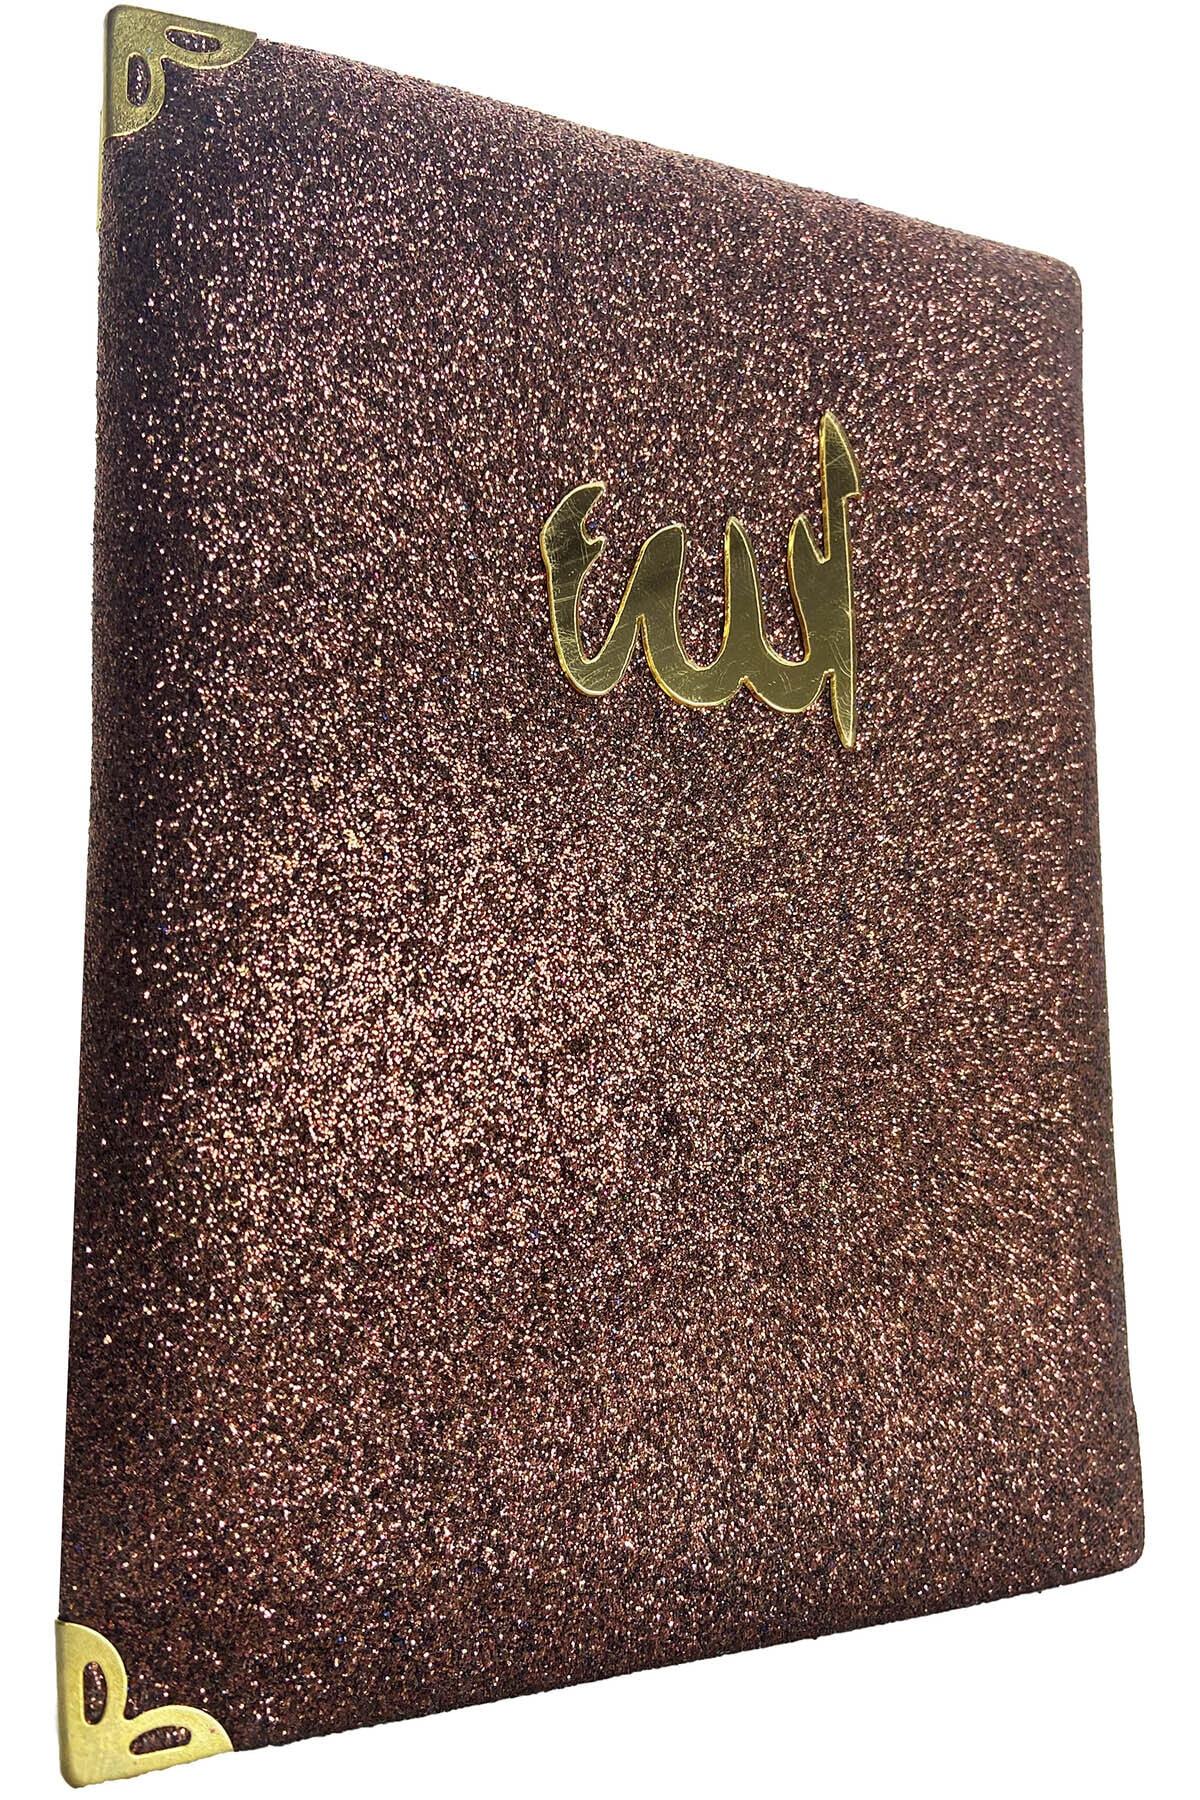 Sim Yasin Book Brown Book Islamic Gifts Cover Ameen Gifts Islamıc Wedding Gifts Hajj Gifts Muslim Gifts